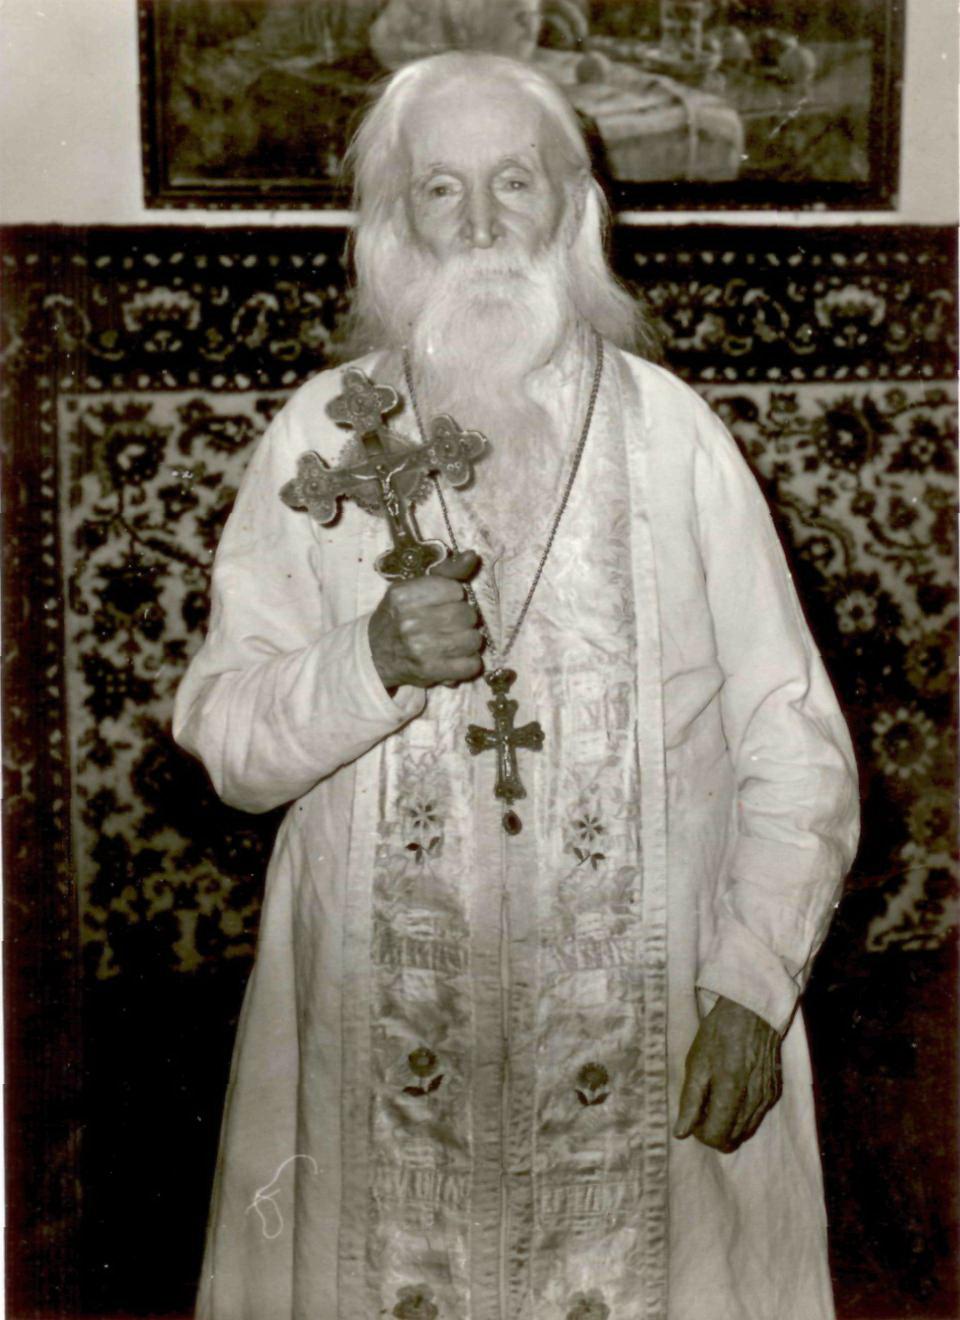 Раскол церкви ХХ века, Сергей Шумило